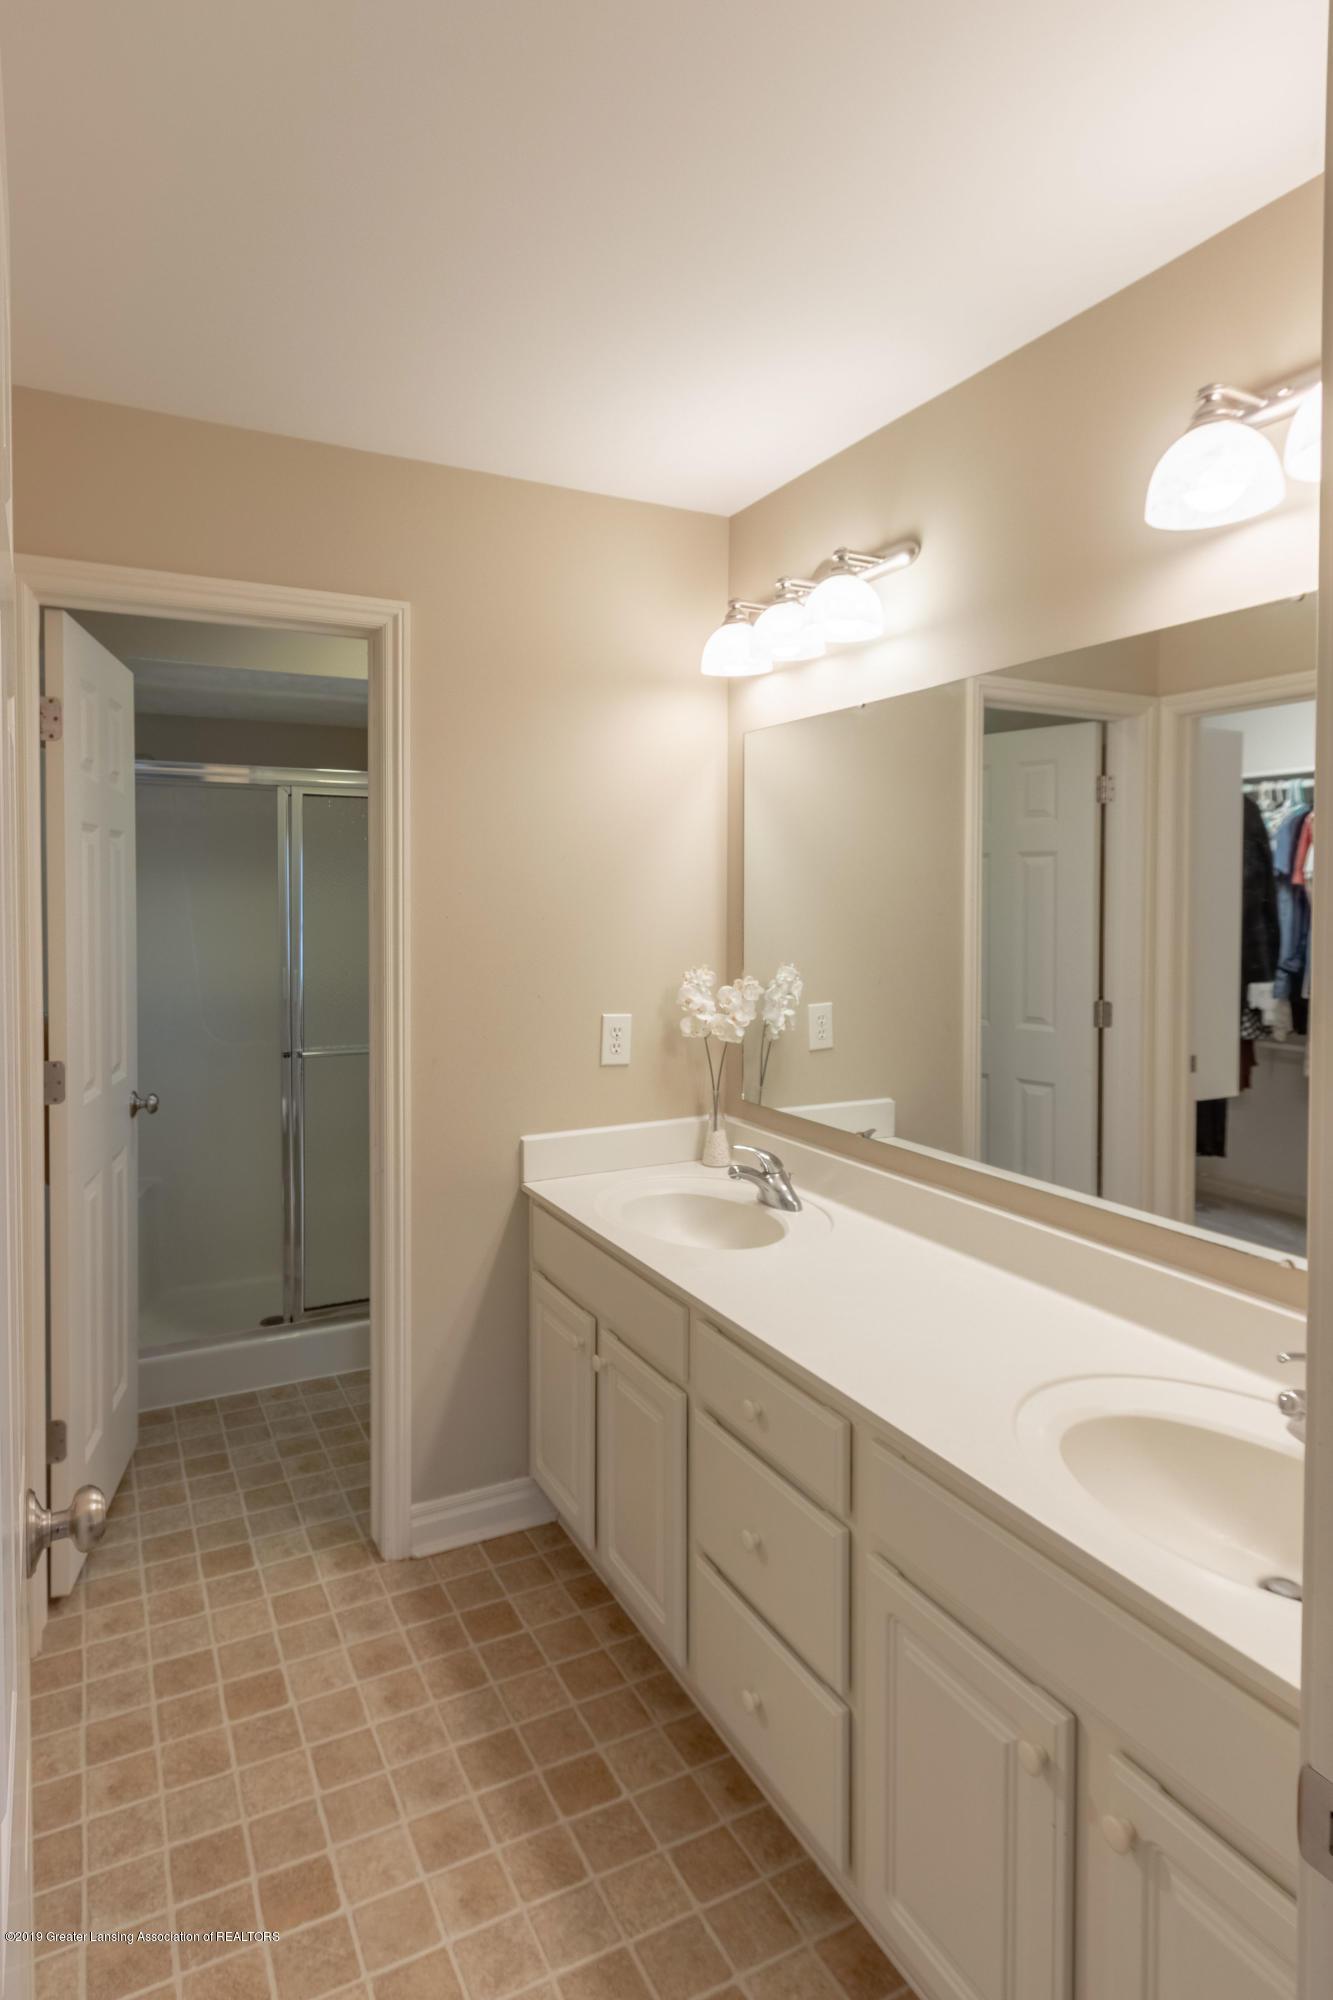 3585 W Arbutus Dr - Master Bathroom - 26